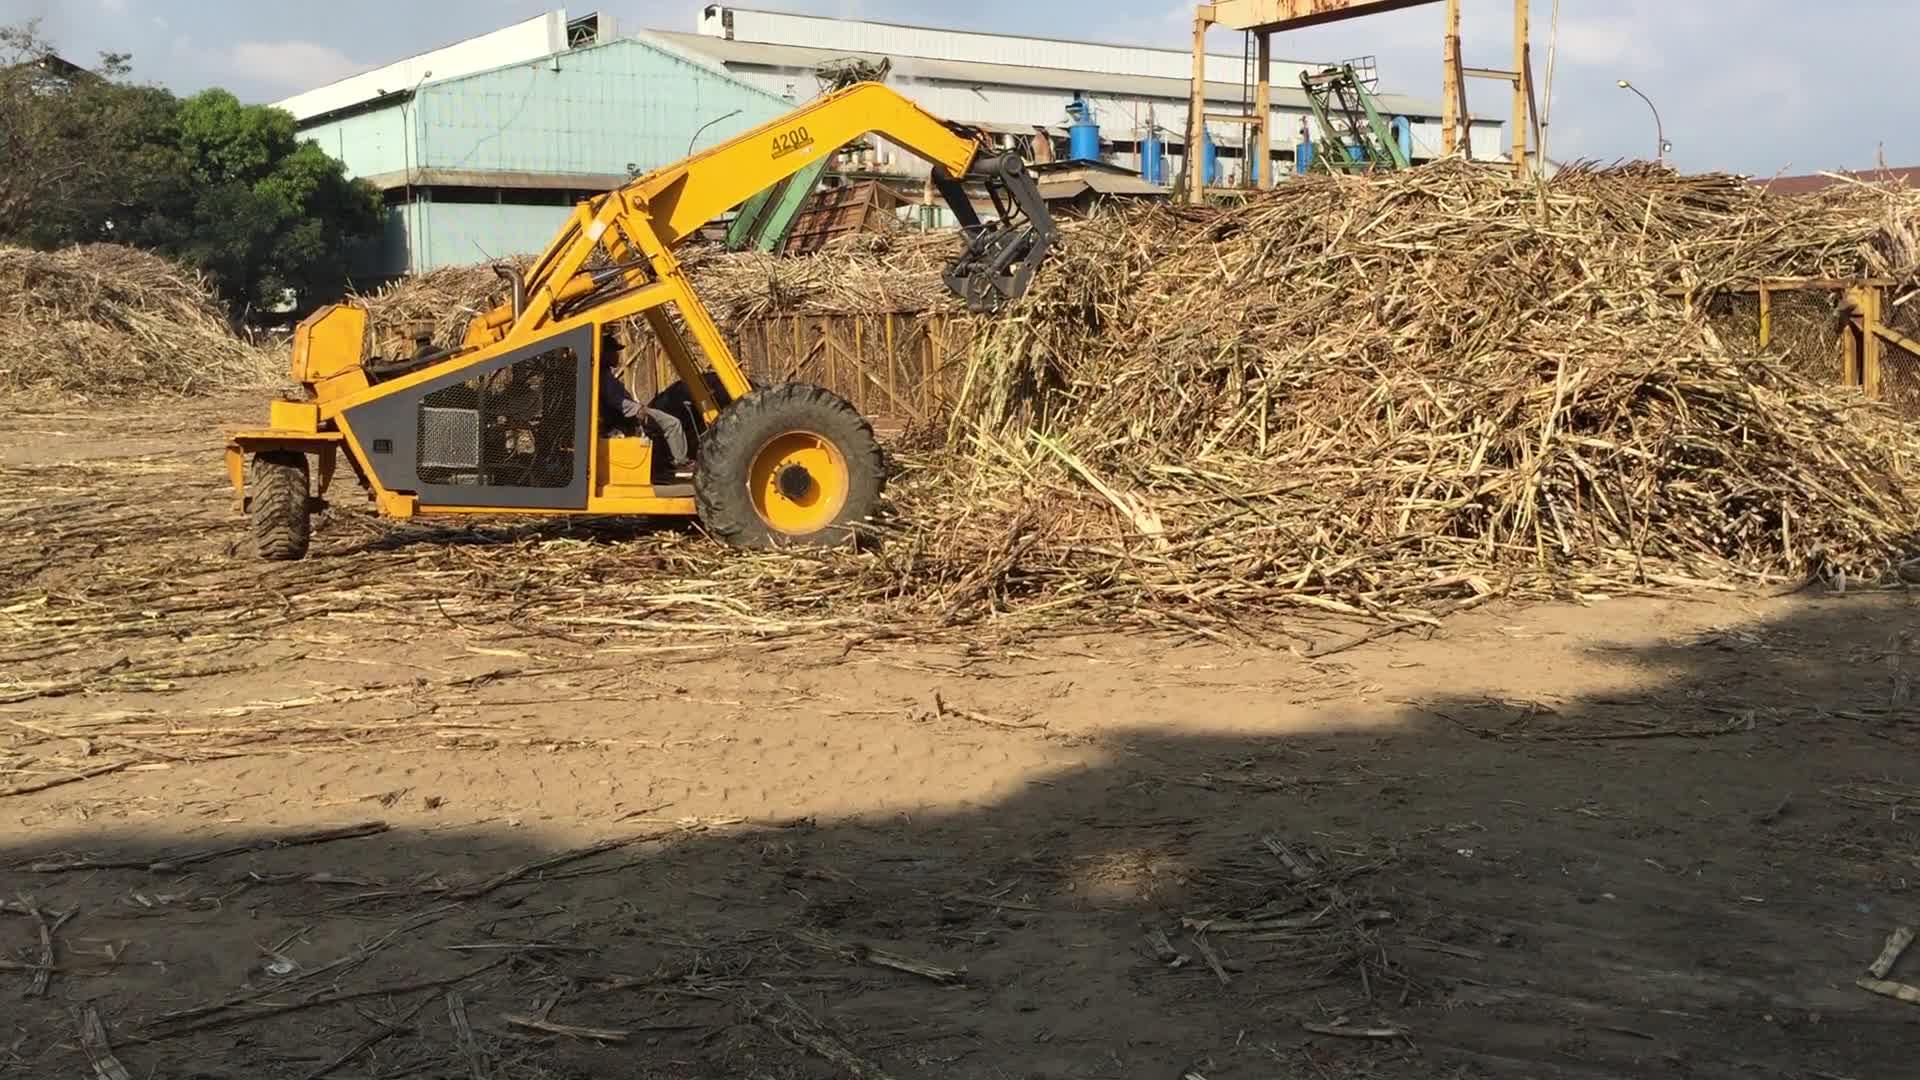 3 wheels cane grab loader made in China